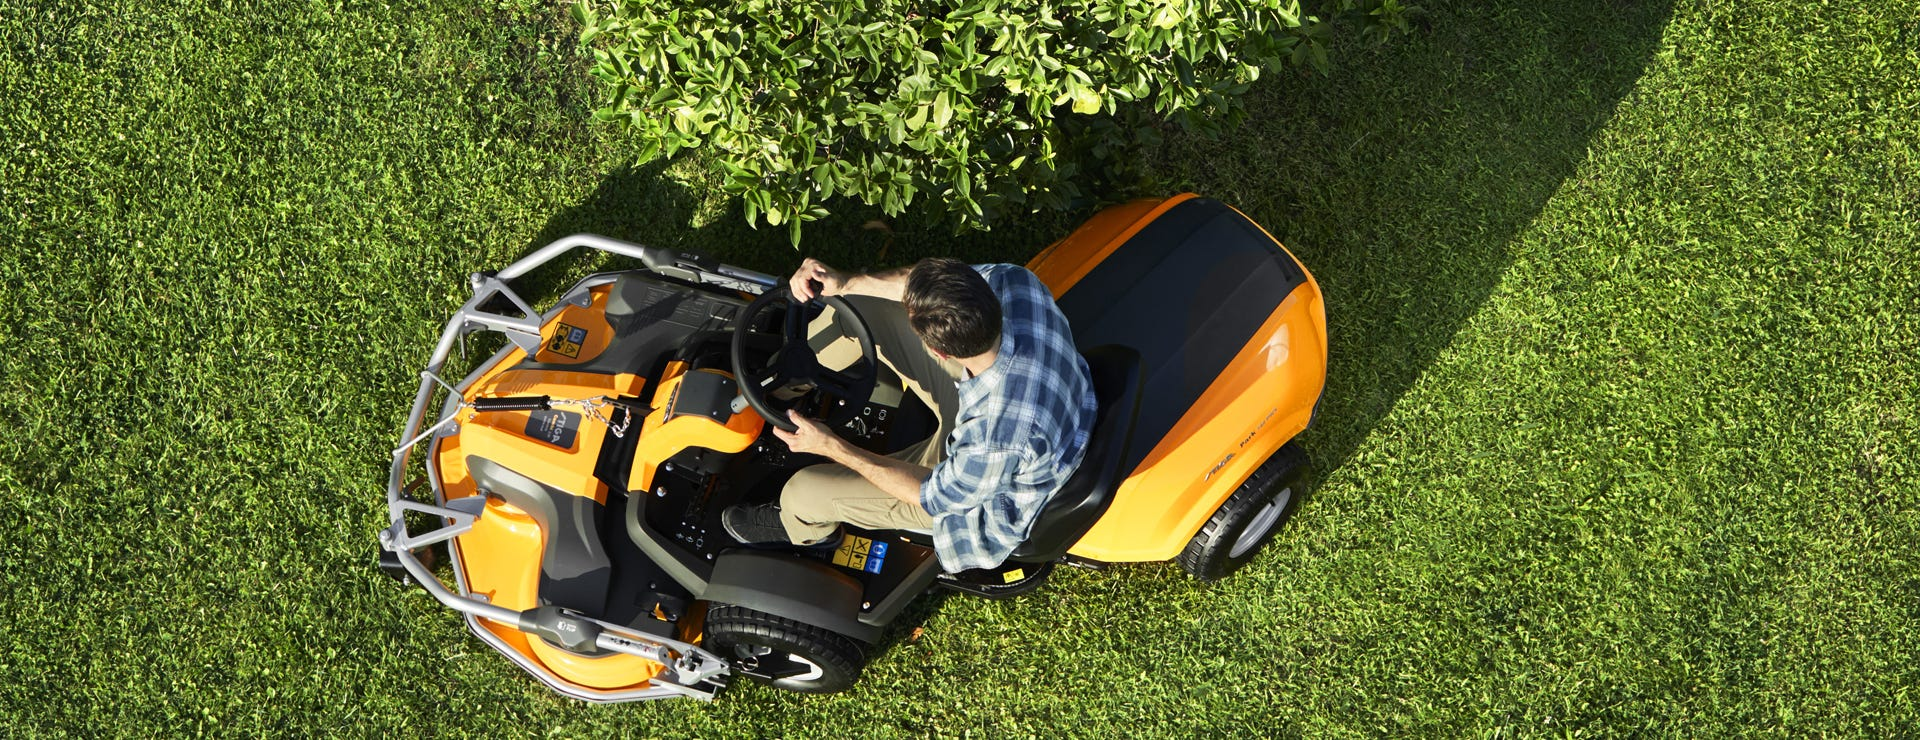 STIGA park pro 740 pwx front mower